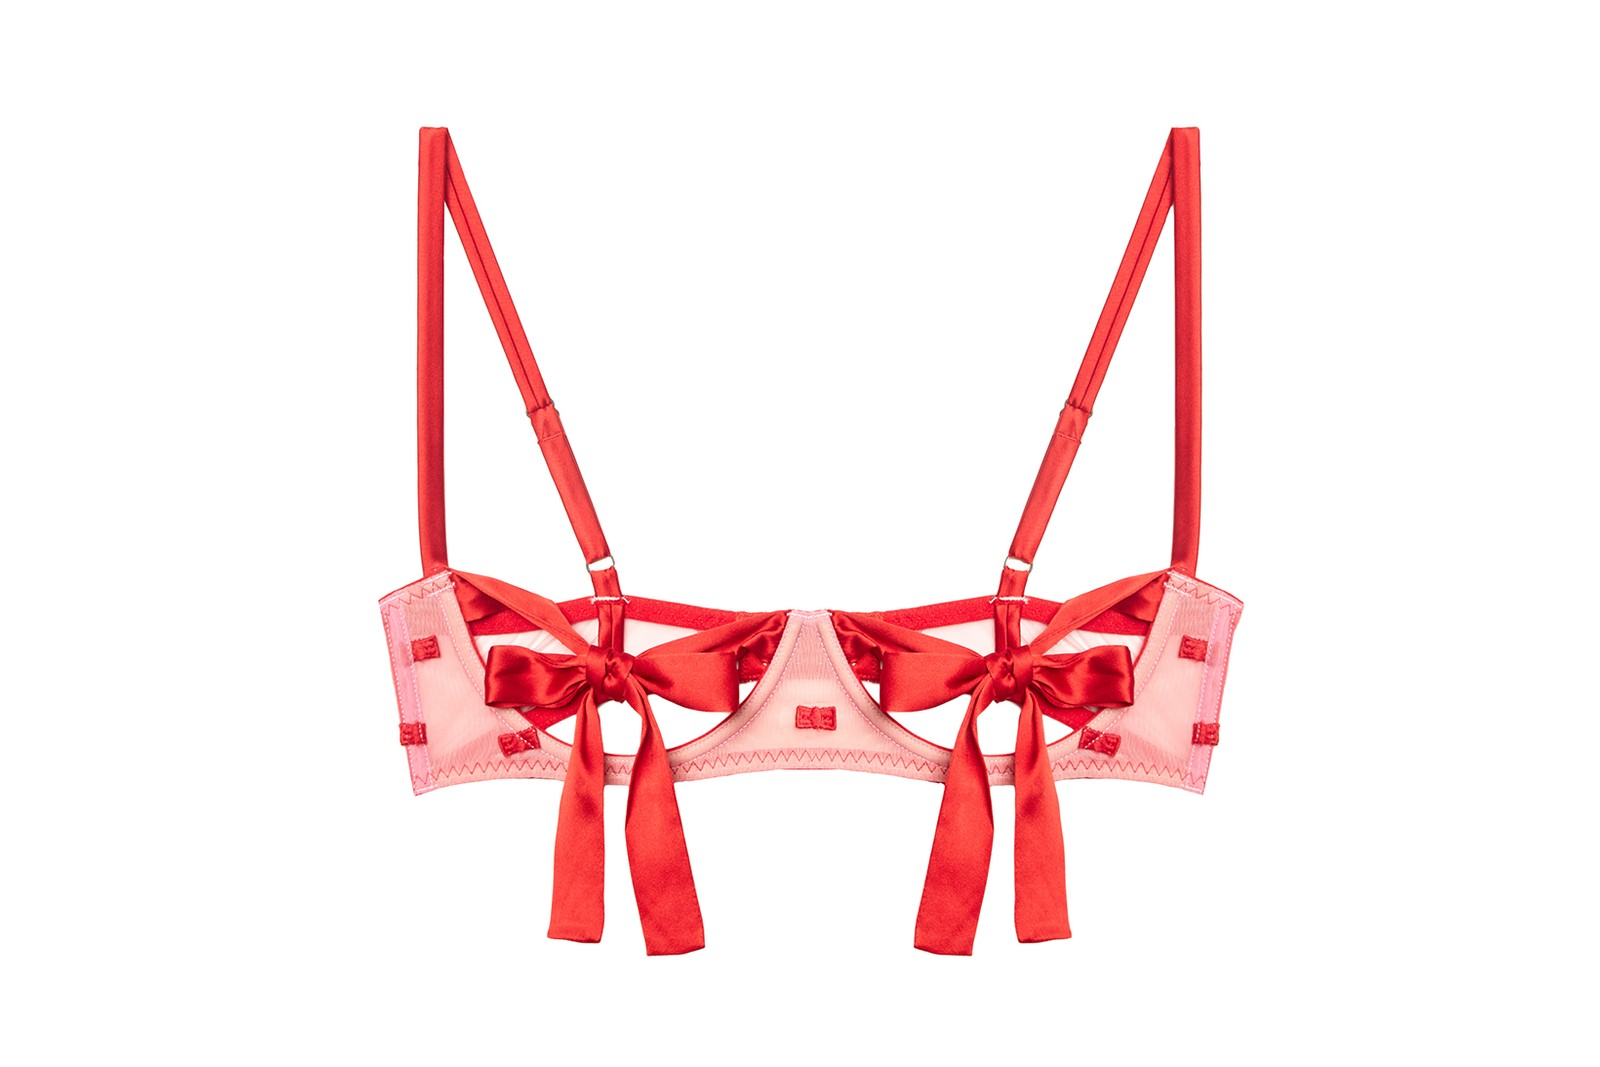 savage x fenty rihanna agent provocateur lingerie bra underwear stockings pink red